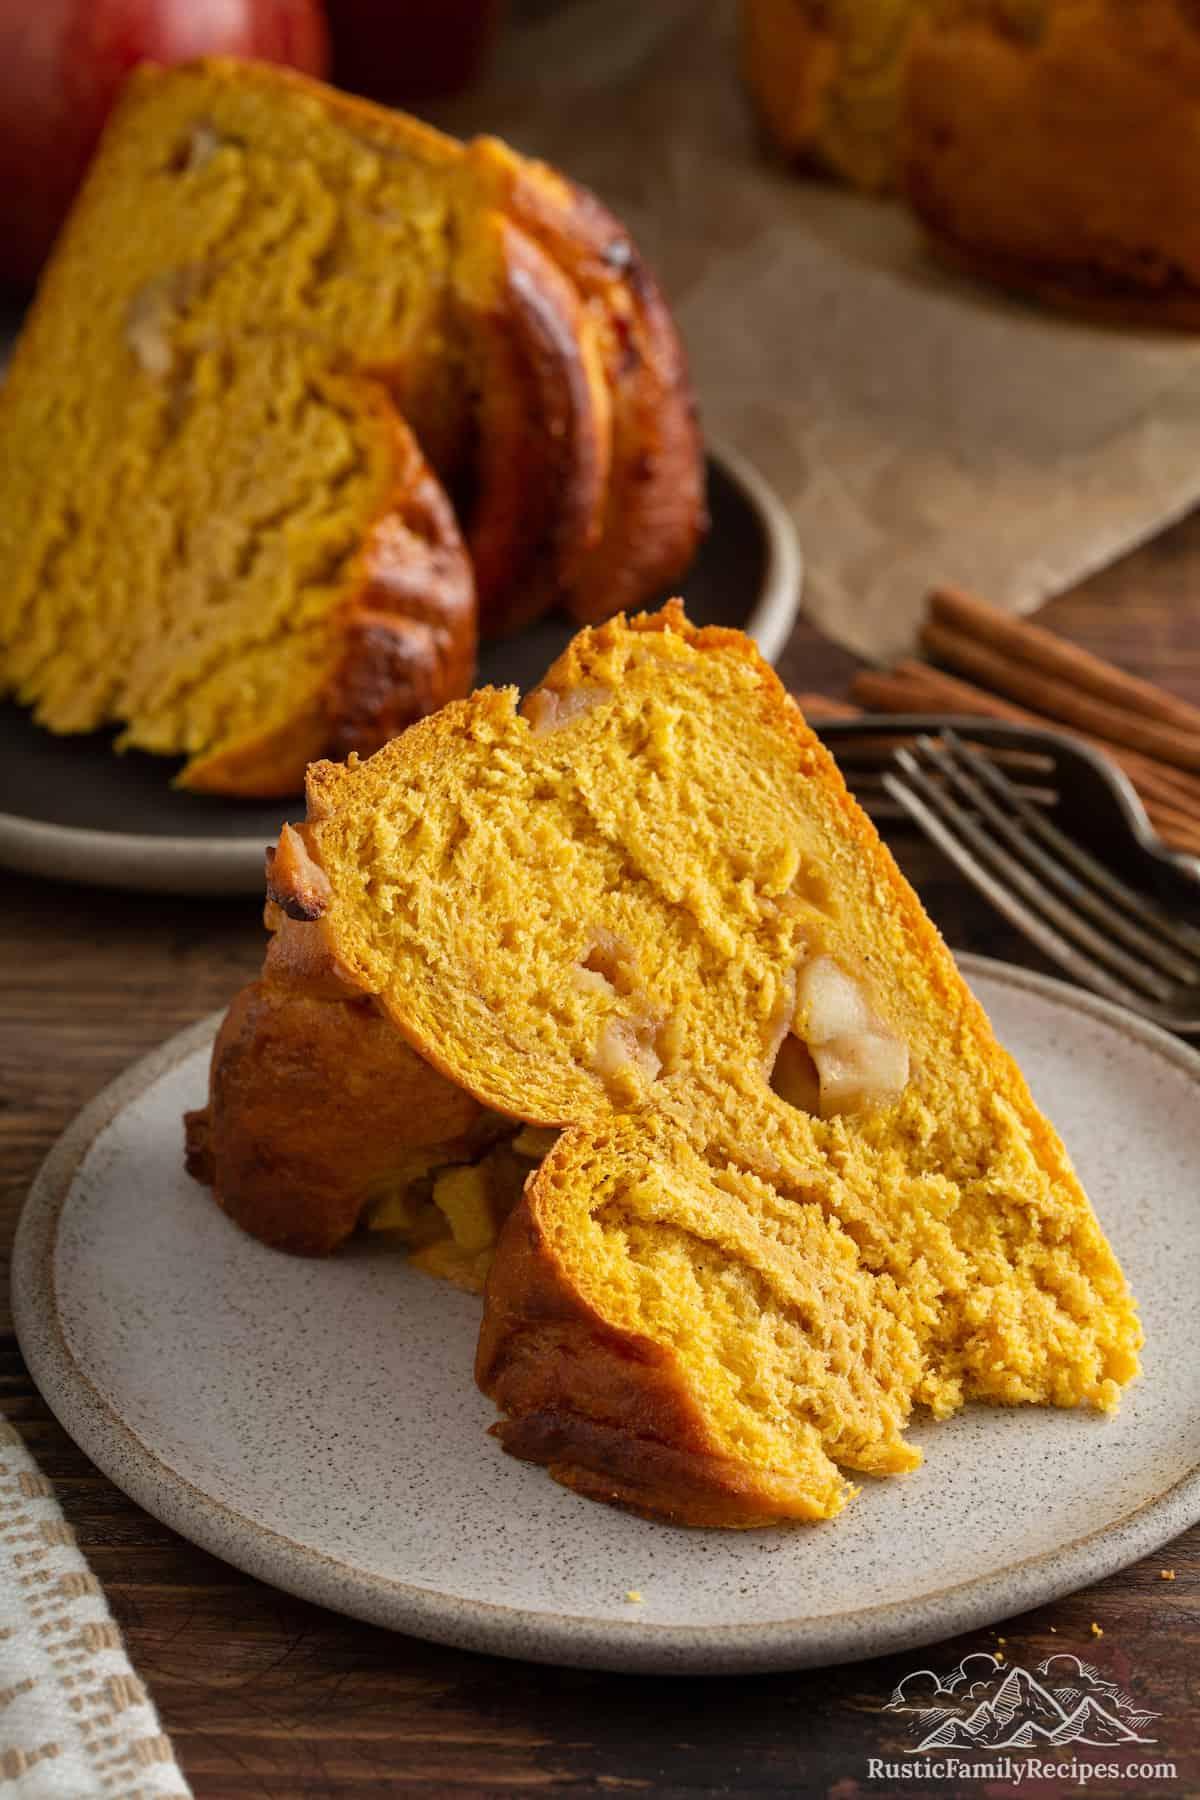 Slice of Pumpkin Apple Apricot Bread on plate